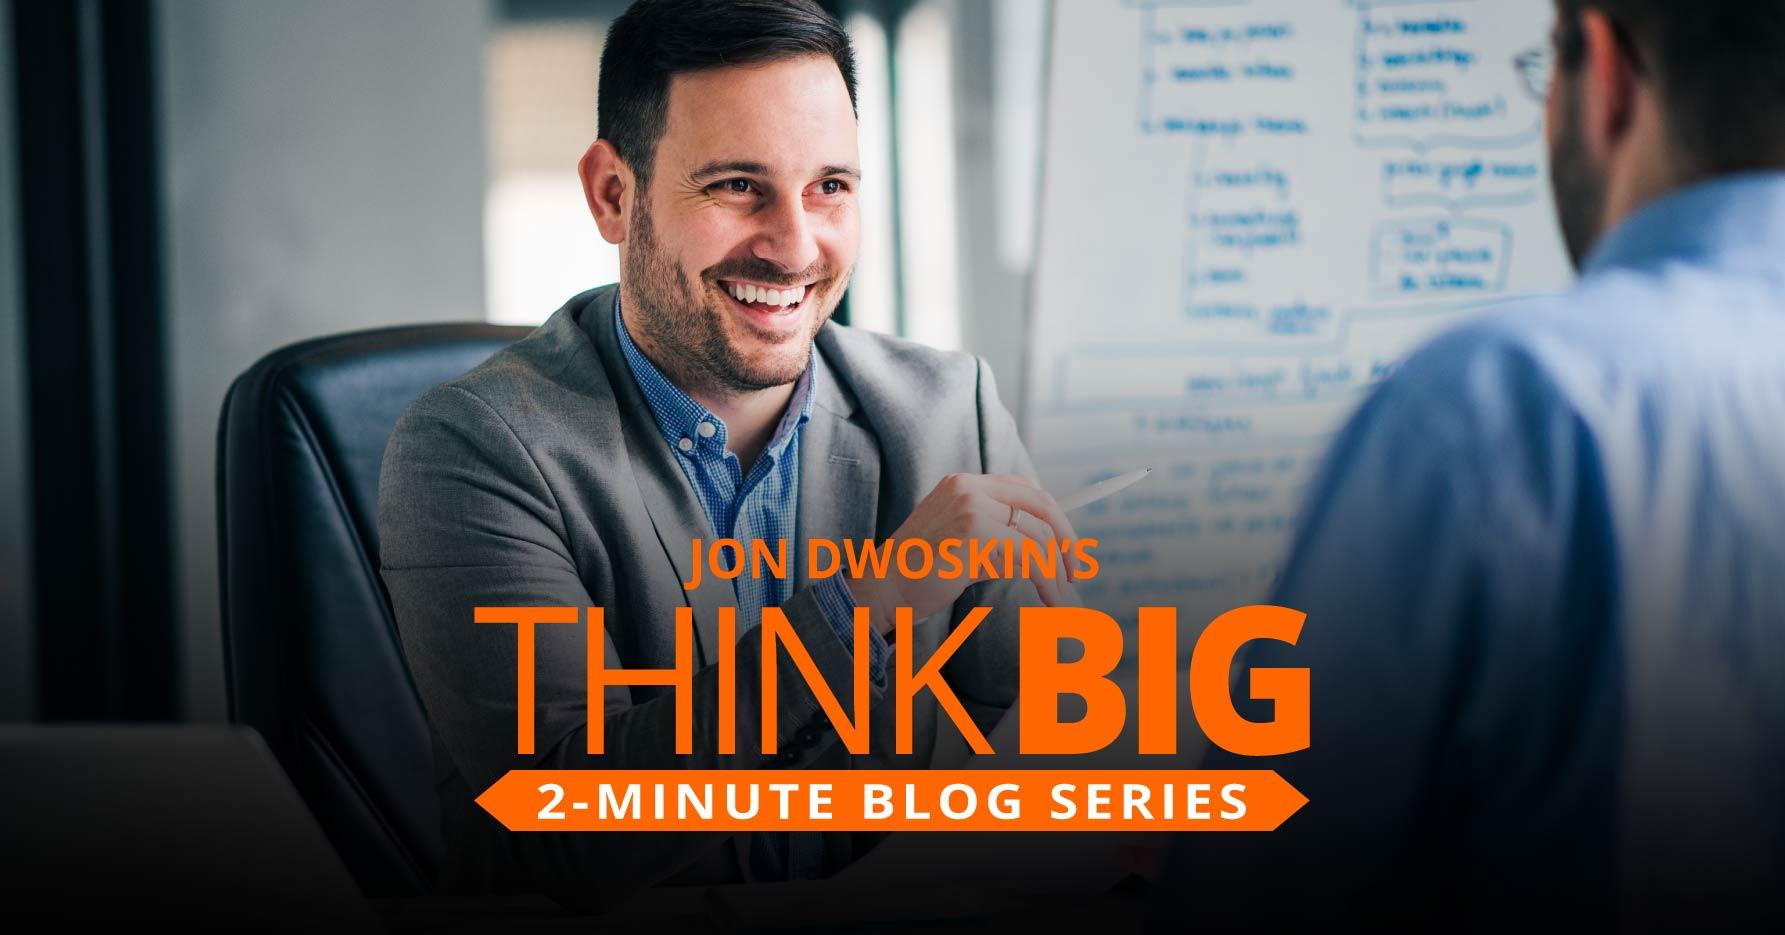 Jon Dwoskin Business Blog: THINK Big 2-Minute Blog: 3 Essential Management Tips